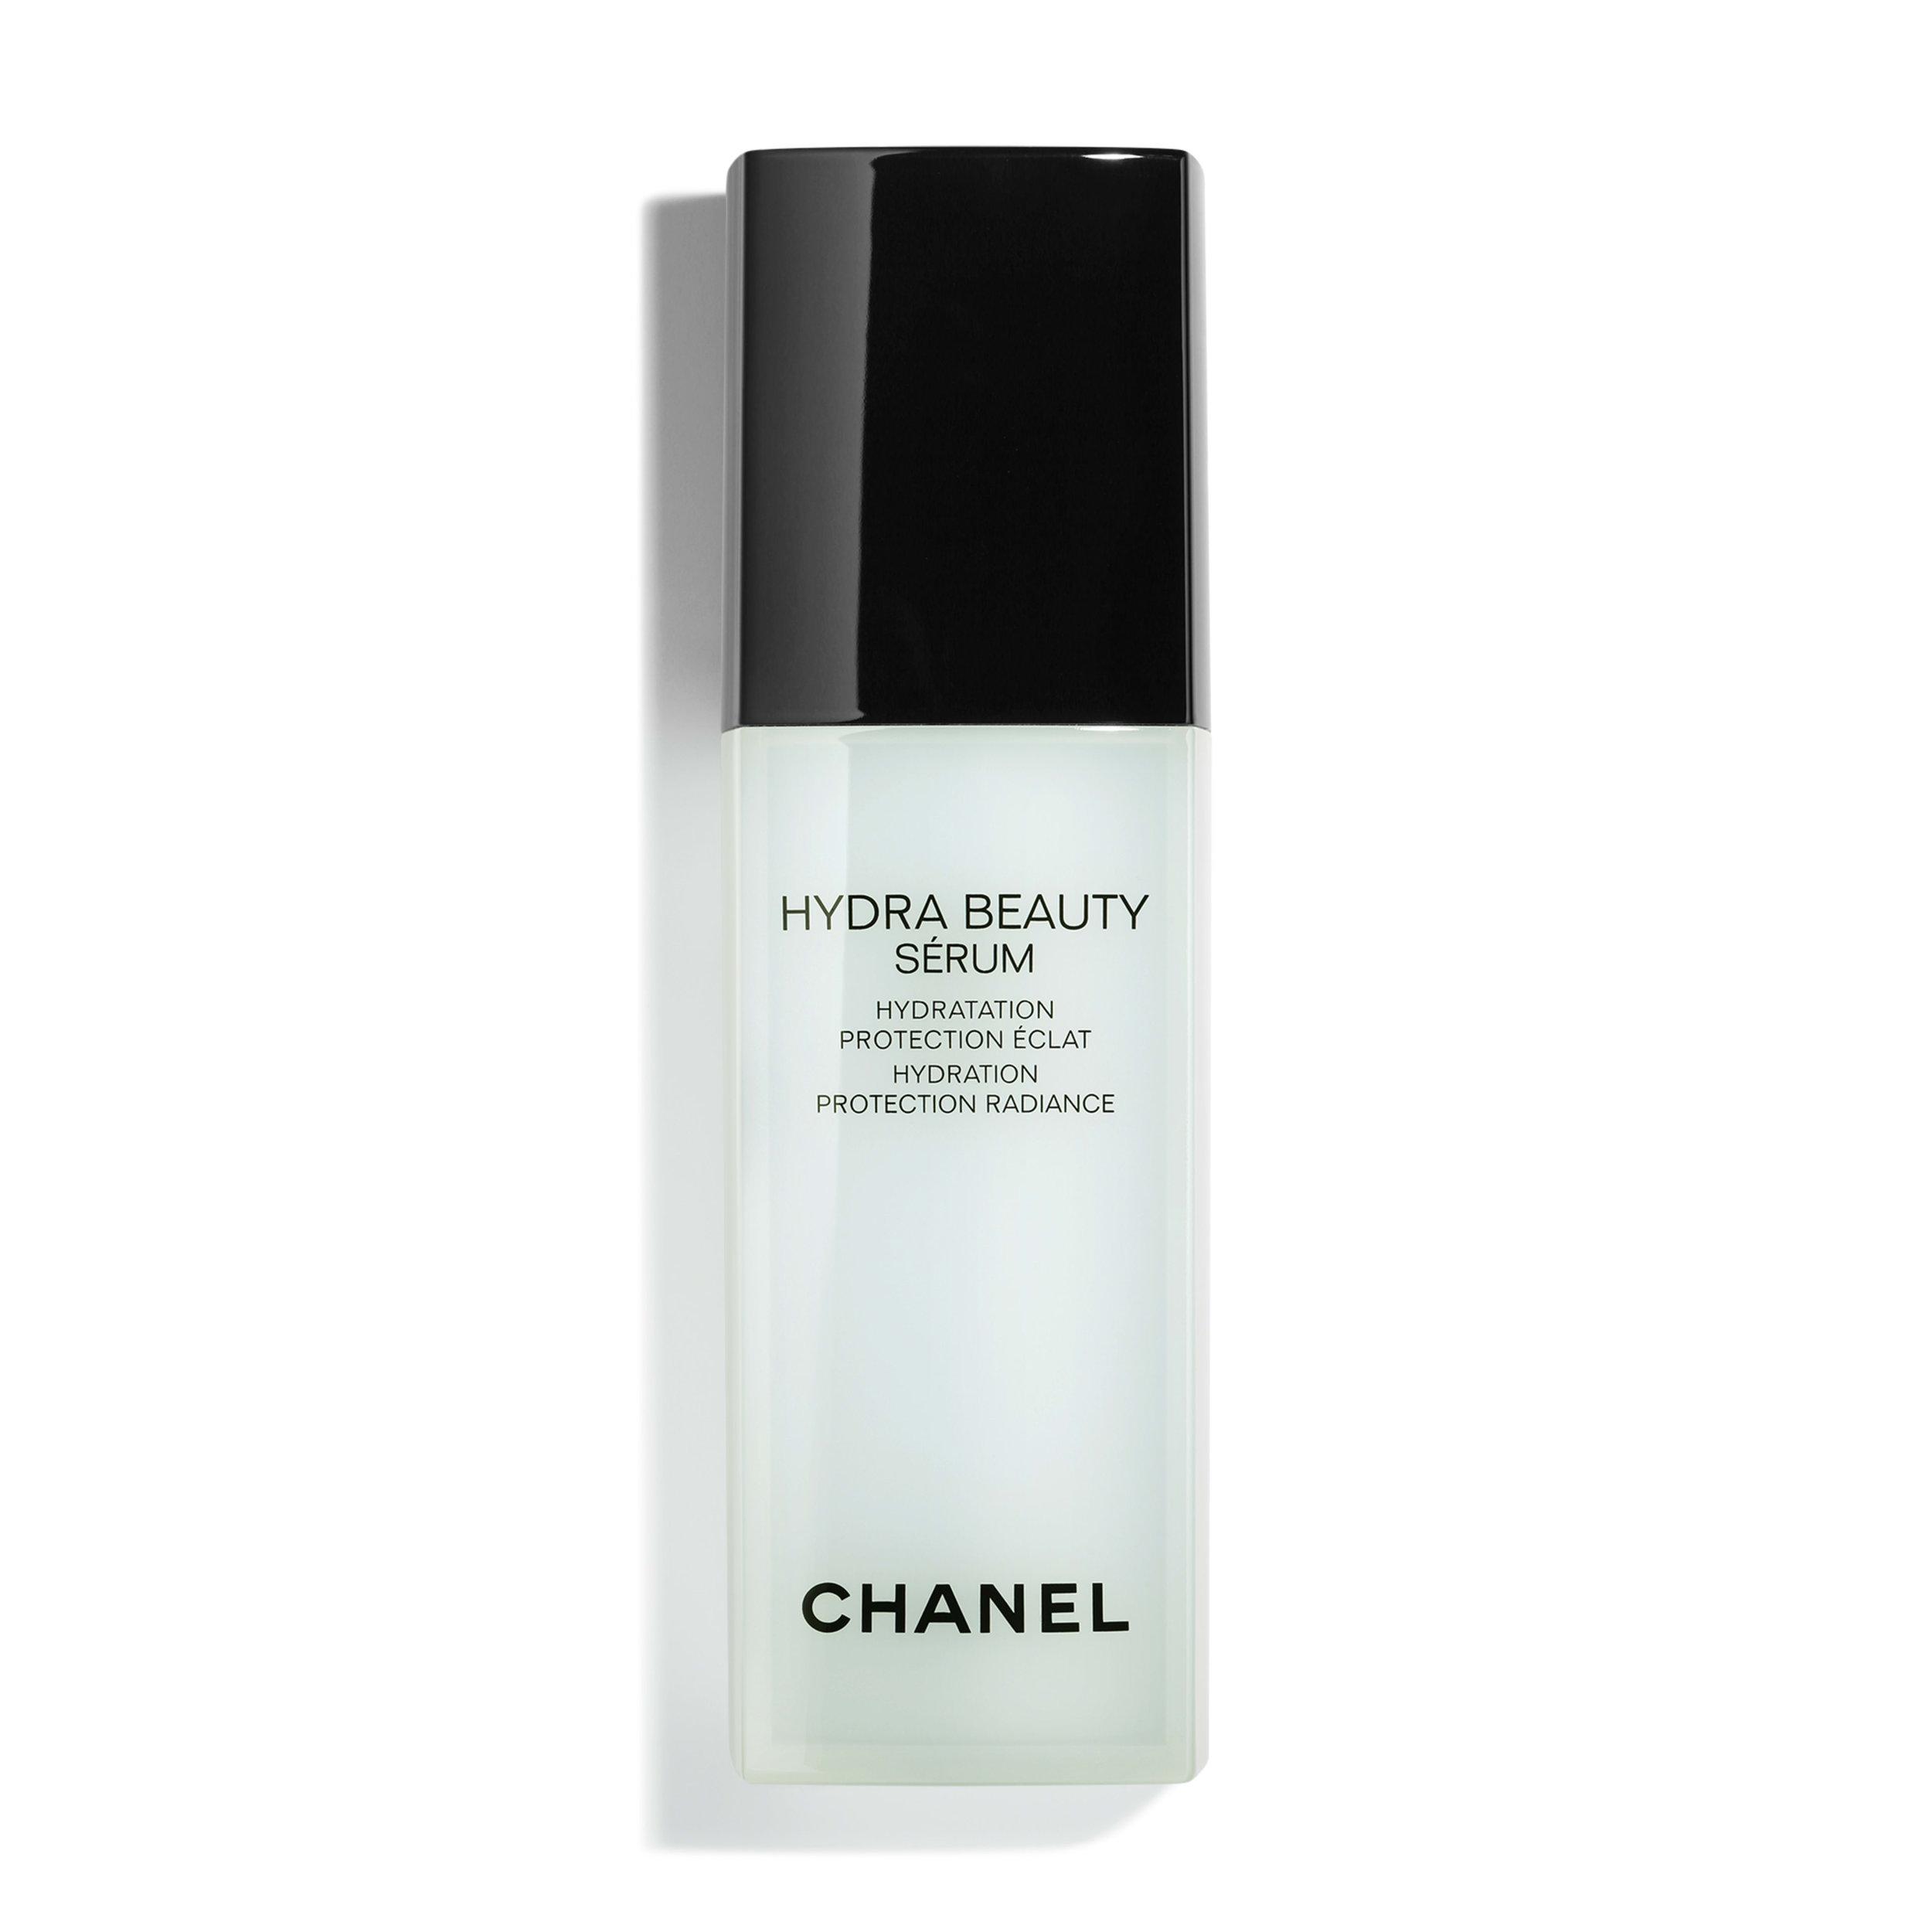 hydra-beauty-serum-packshot-default-143020-8818160369694.jpg